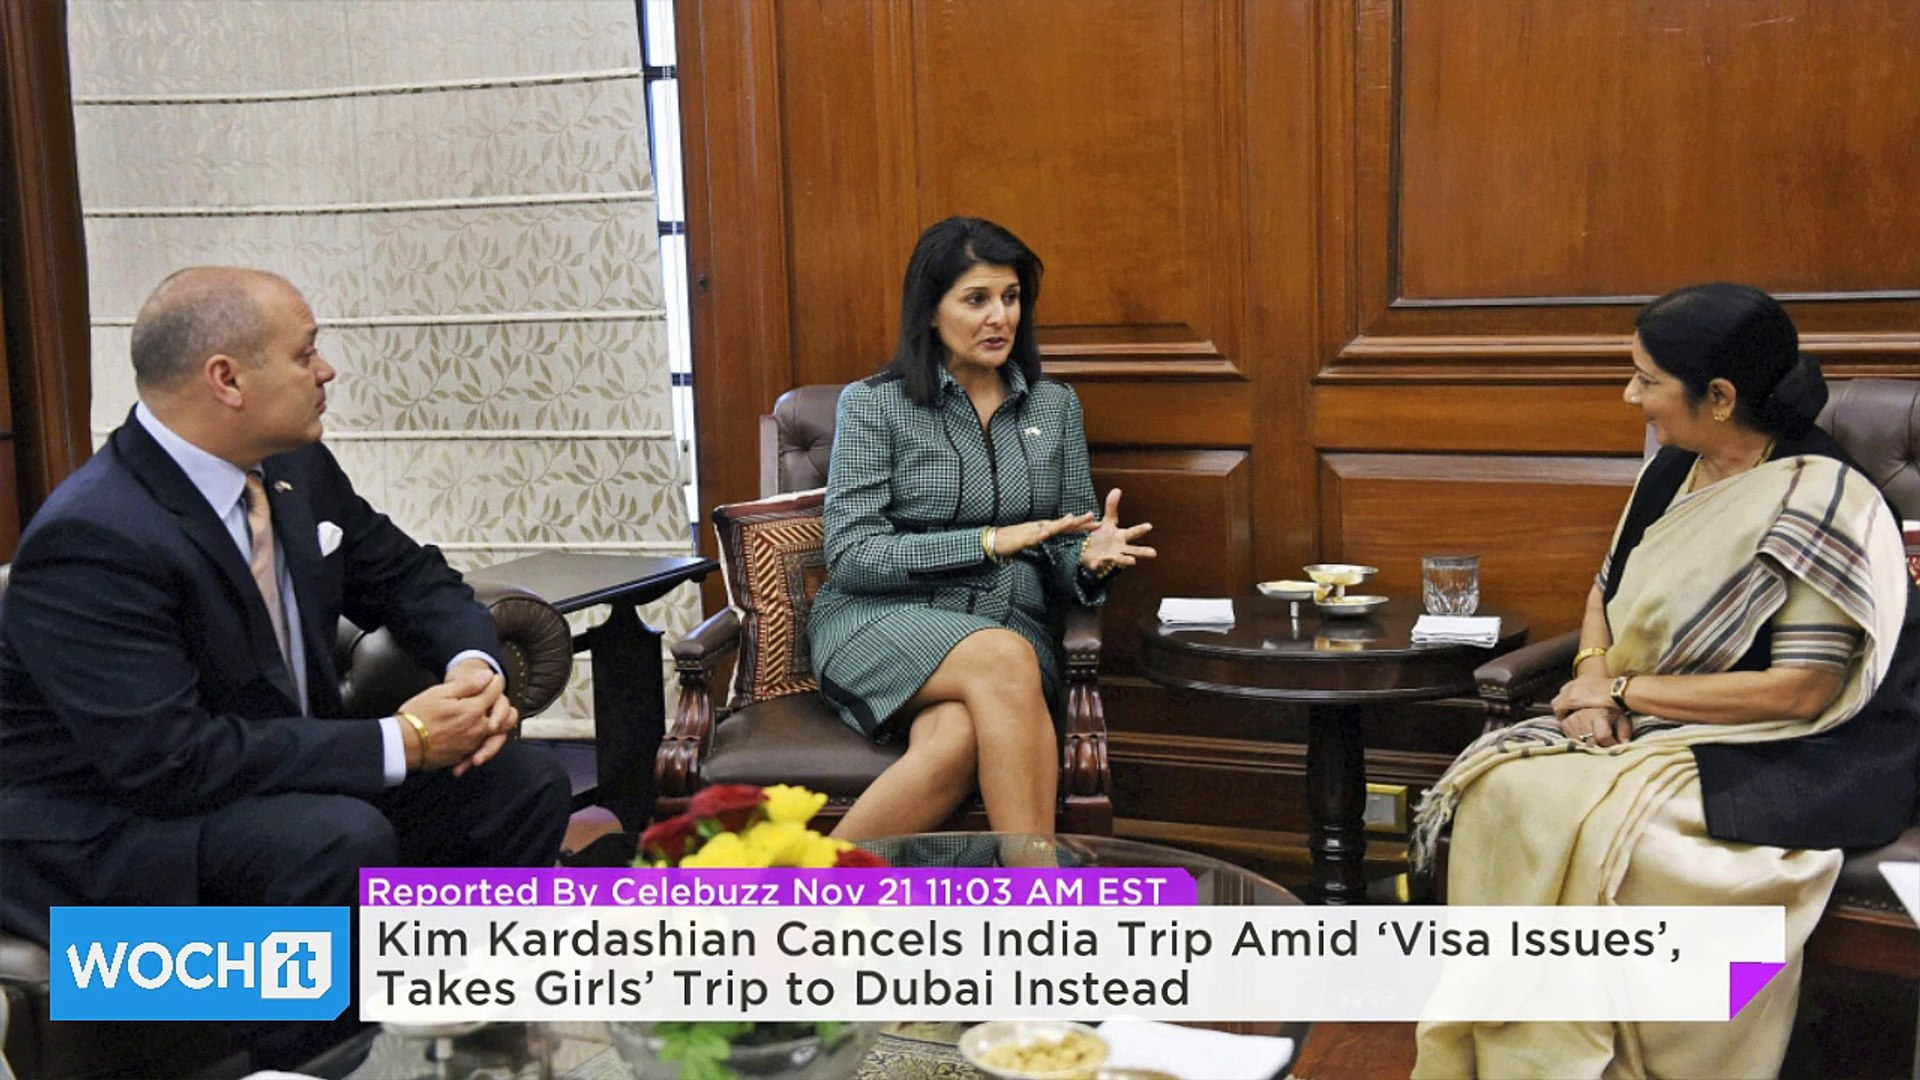 Kim Kardashian Cancels India Trip Amid 'Visa Issues', Takes Girls' Trip to Dubai Instead